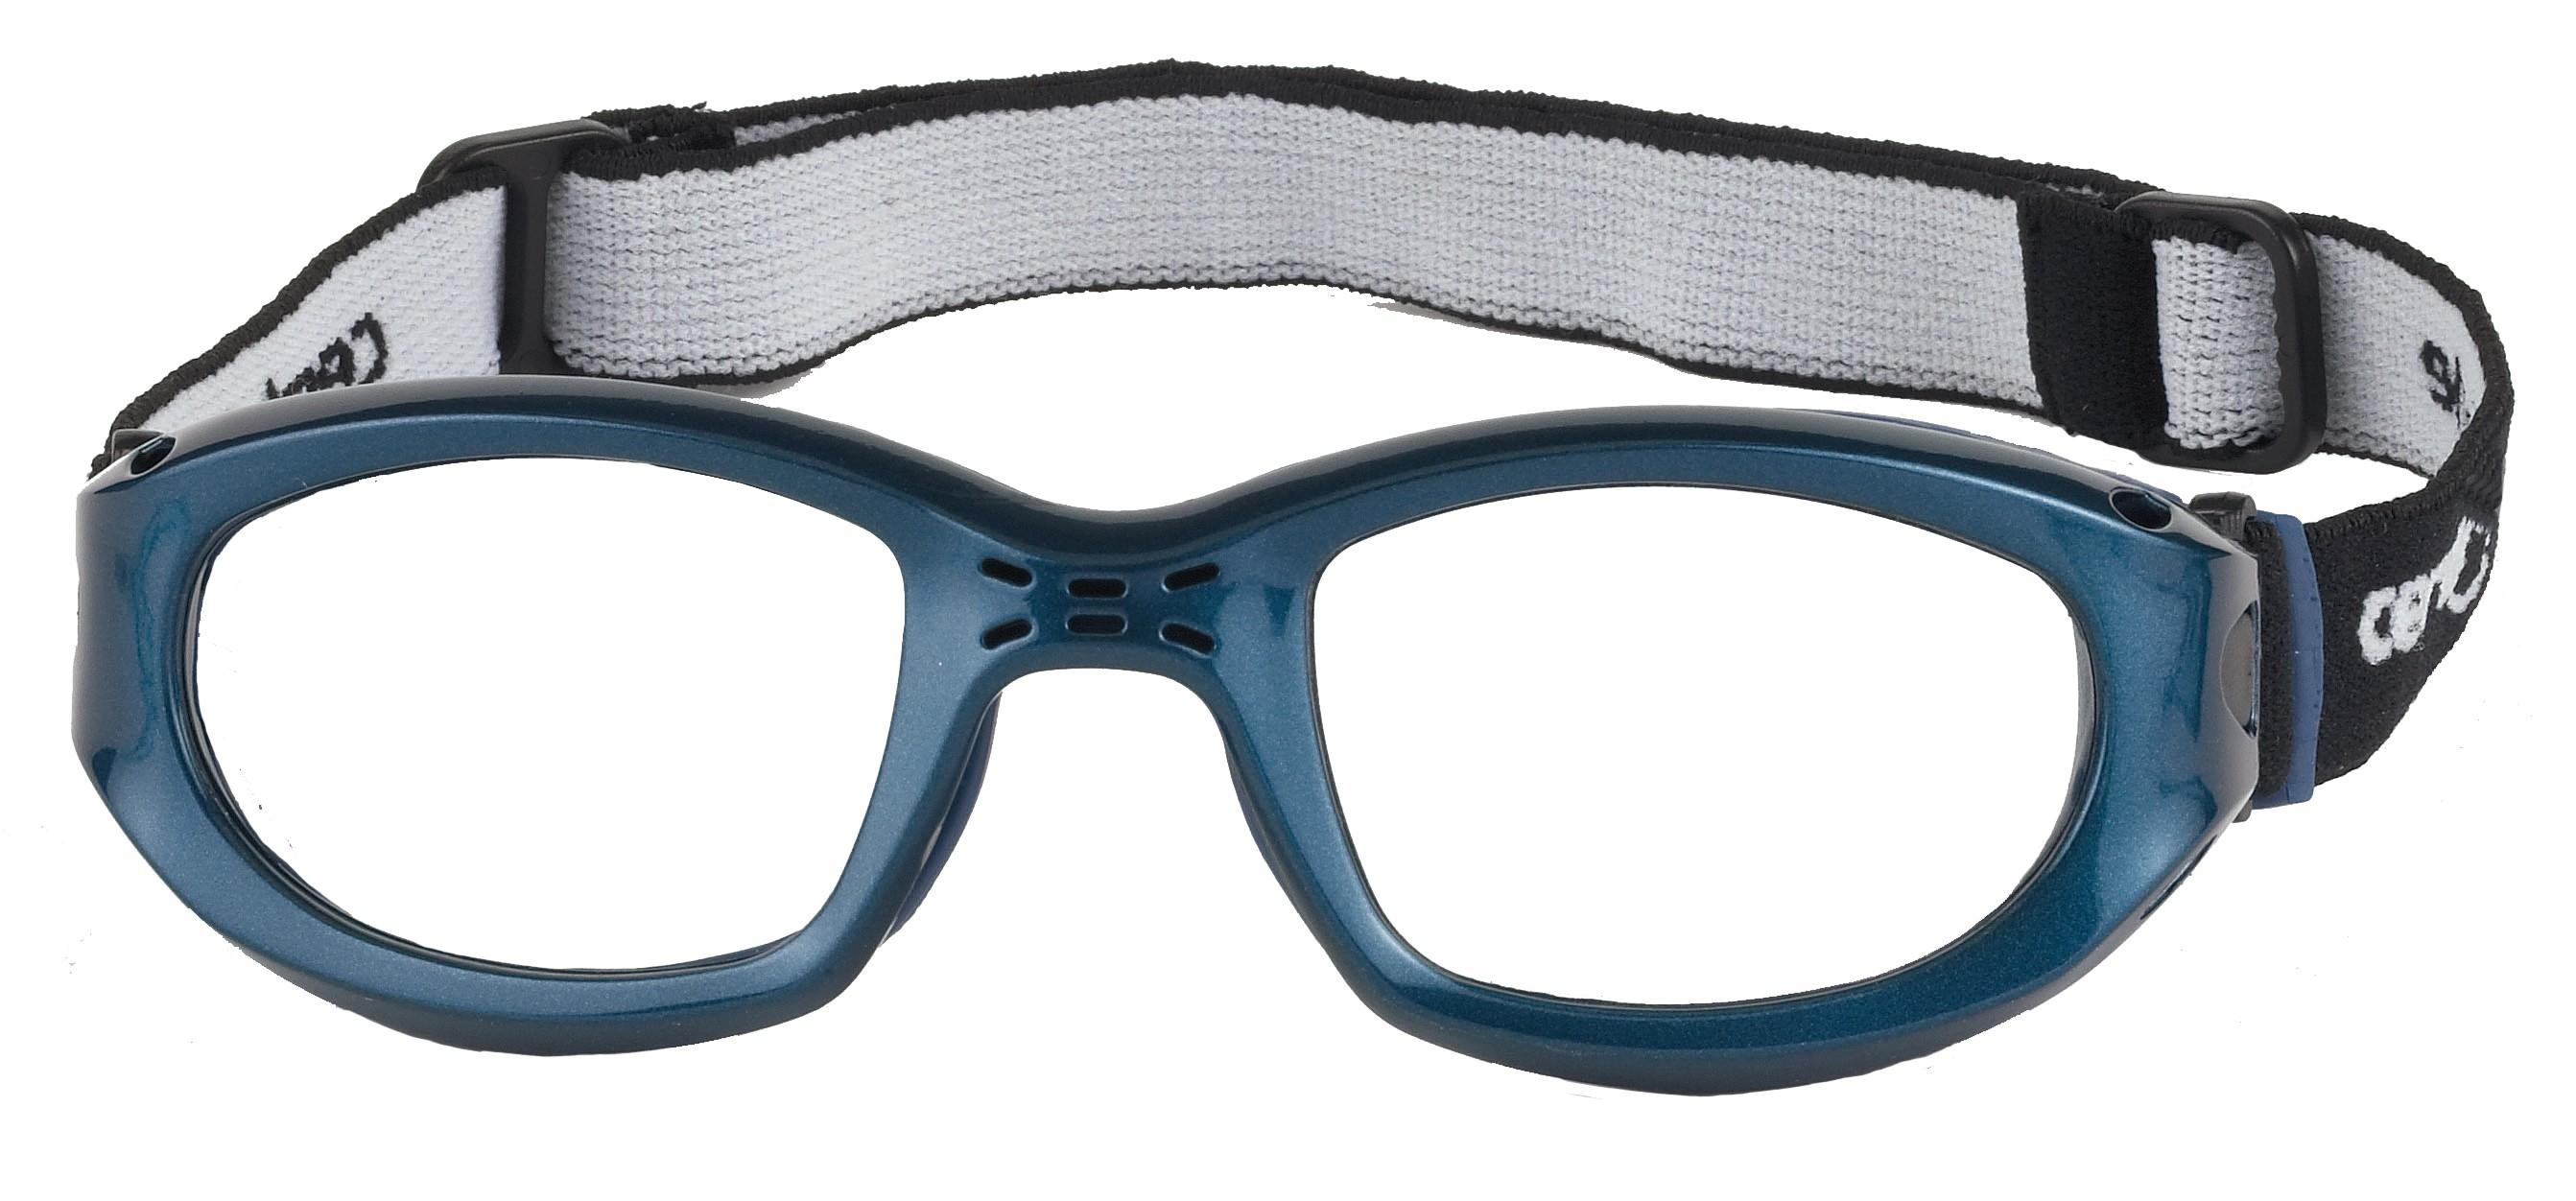 d7fa6d4d4df Centrostyle kids sports eyewear safety glasses online jpg 2685x1252 Sports  eyewear